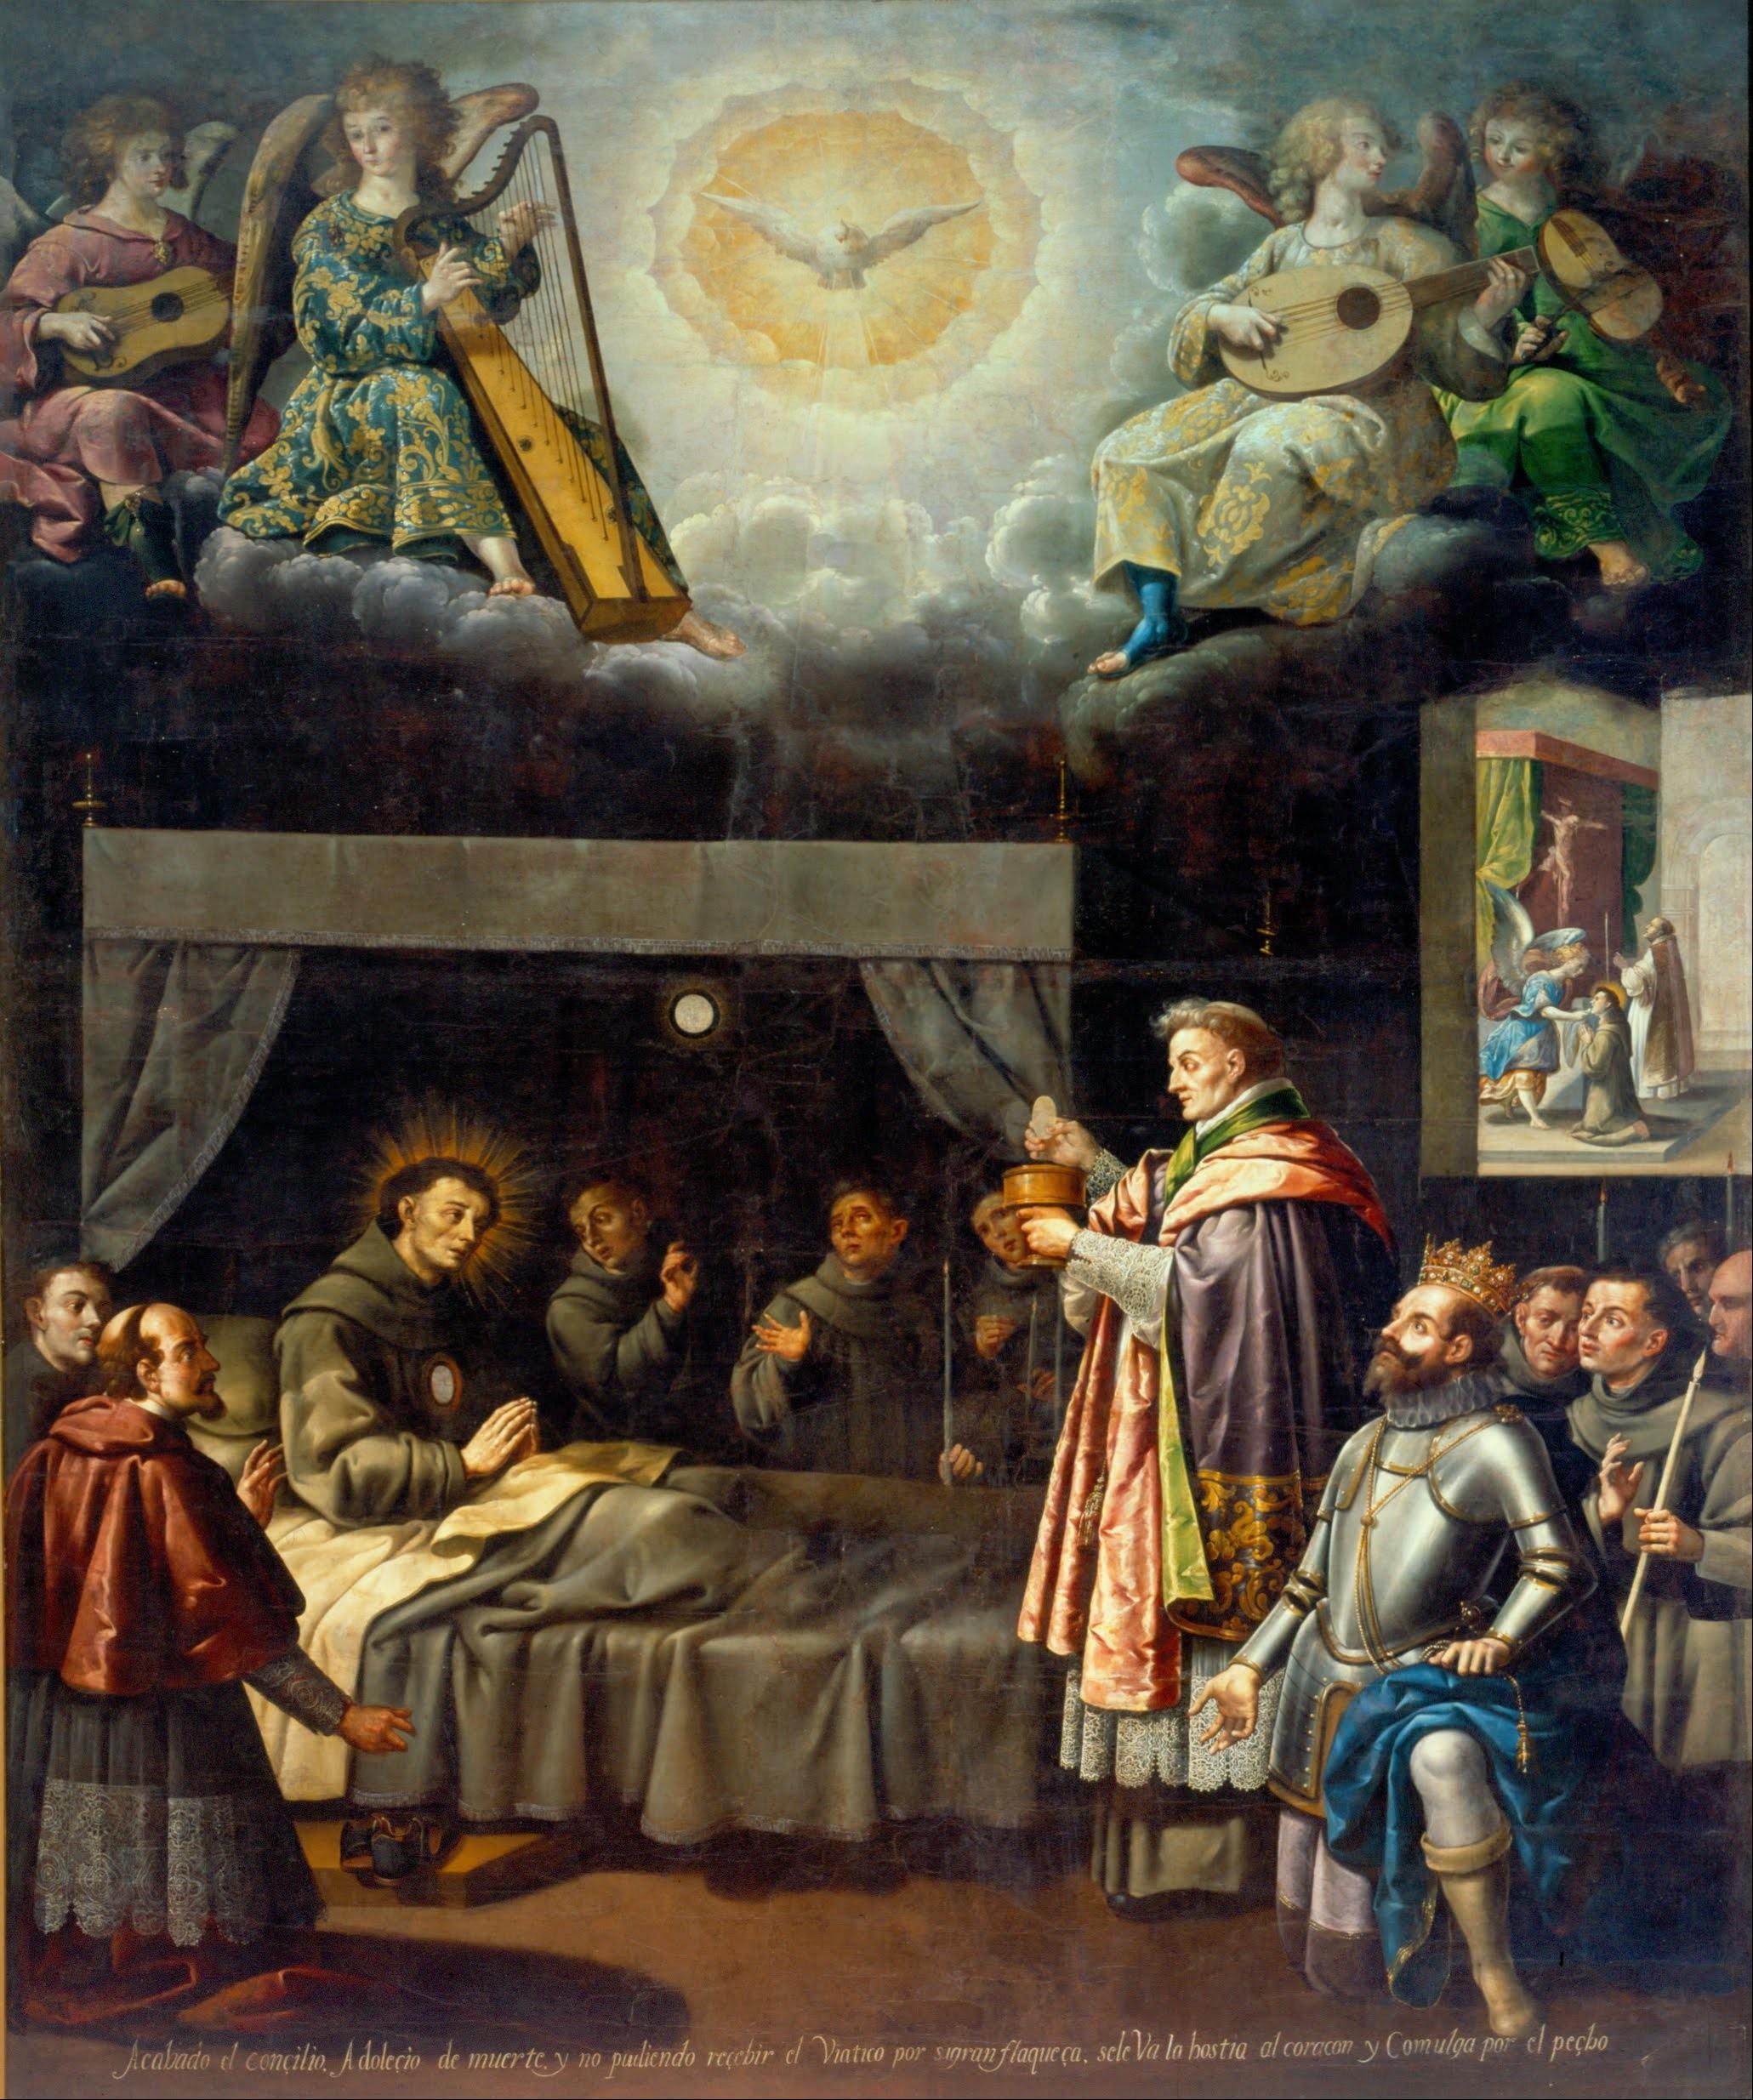 José Juárez Ultima unione di S Bonaventura XVII sec Museo Nacional de Arte Mexico City